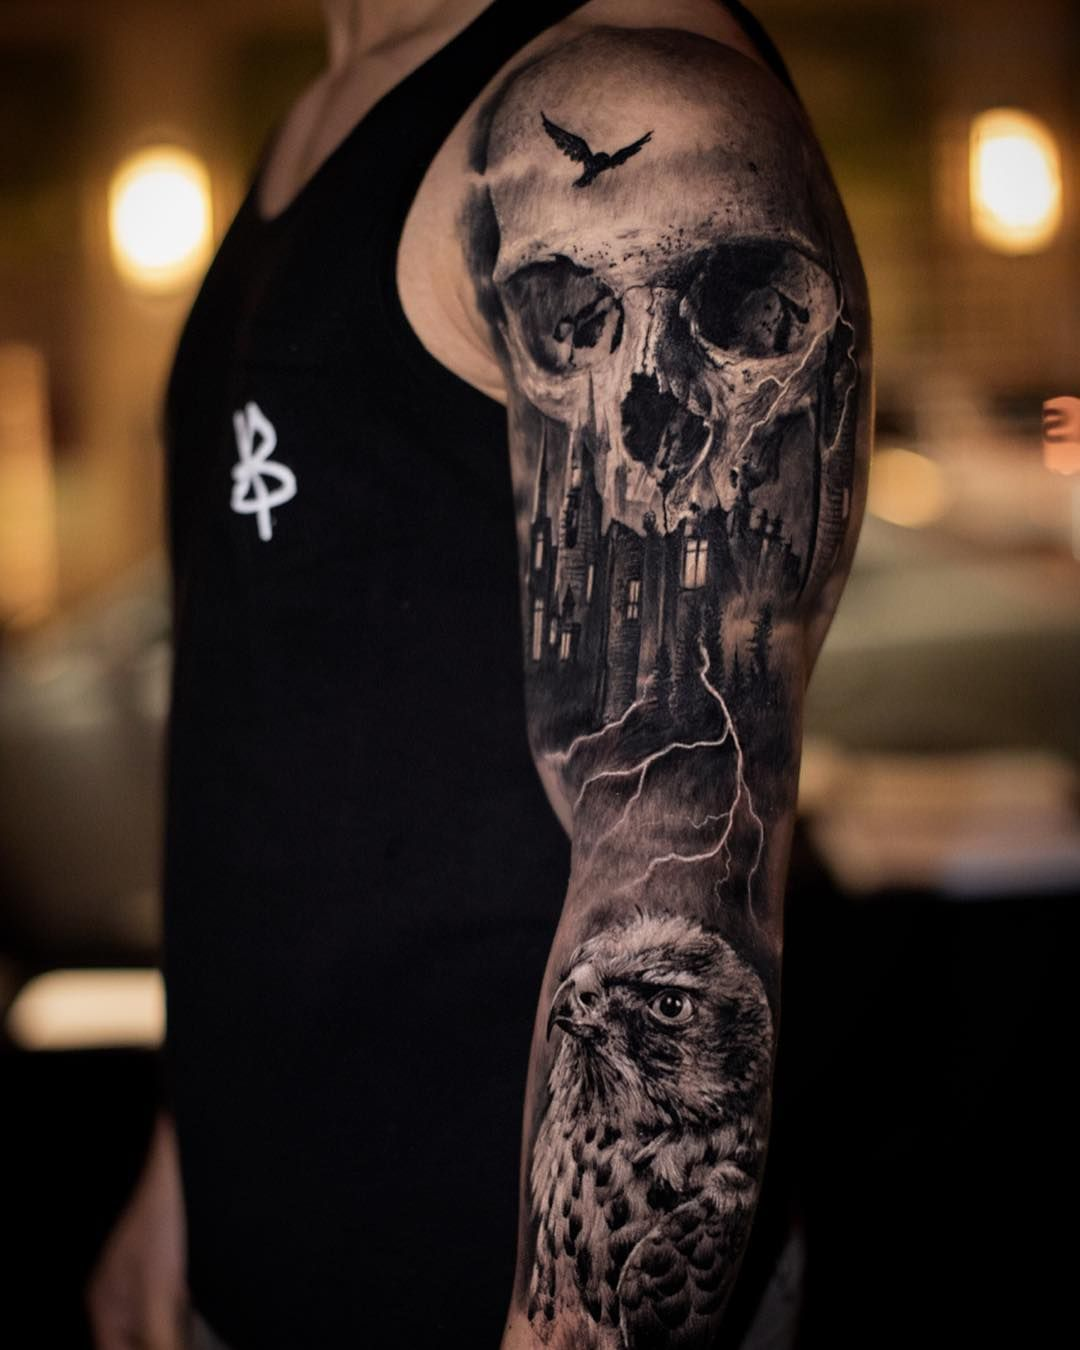 Yomico Moreno Yomicoart Moreno Unterarm Tattoo Mann Vorlagen